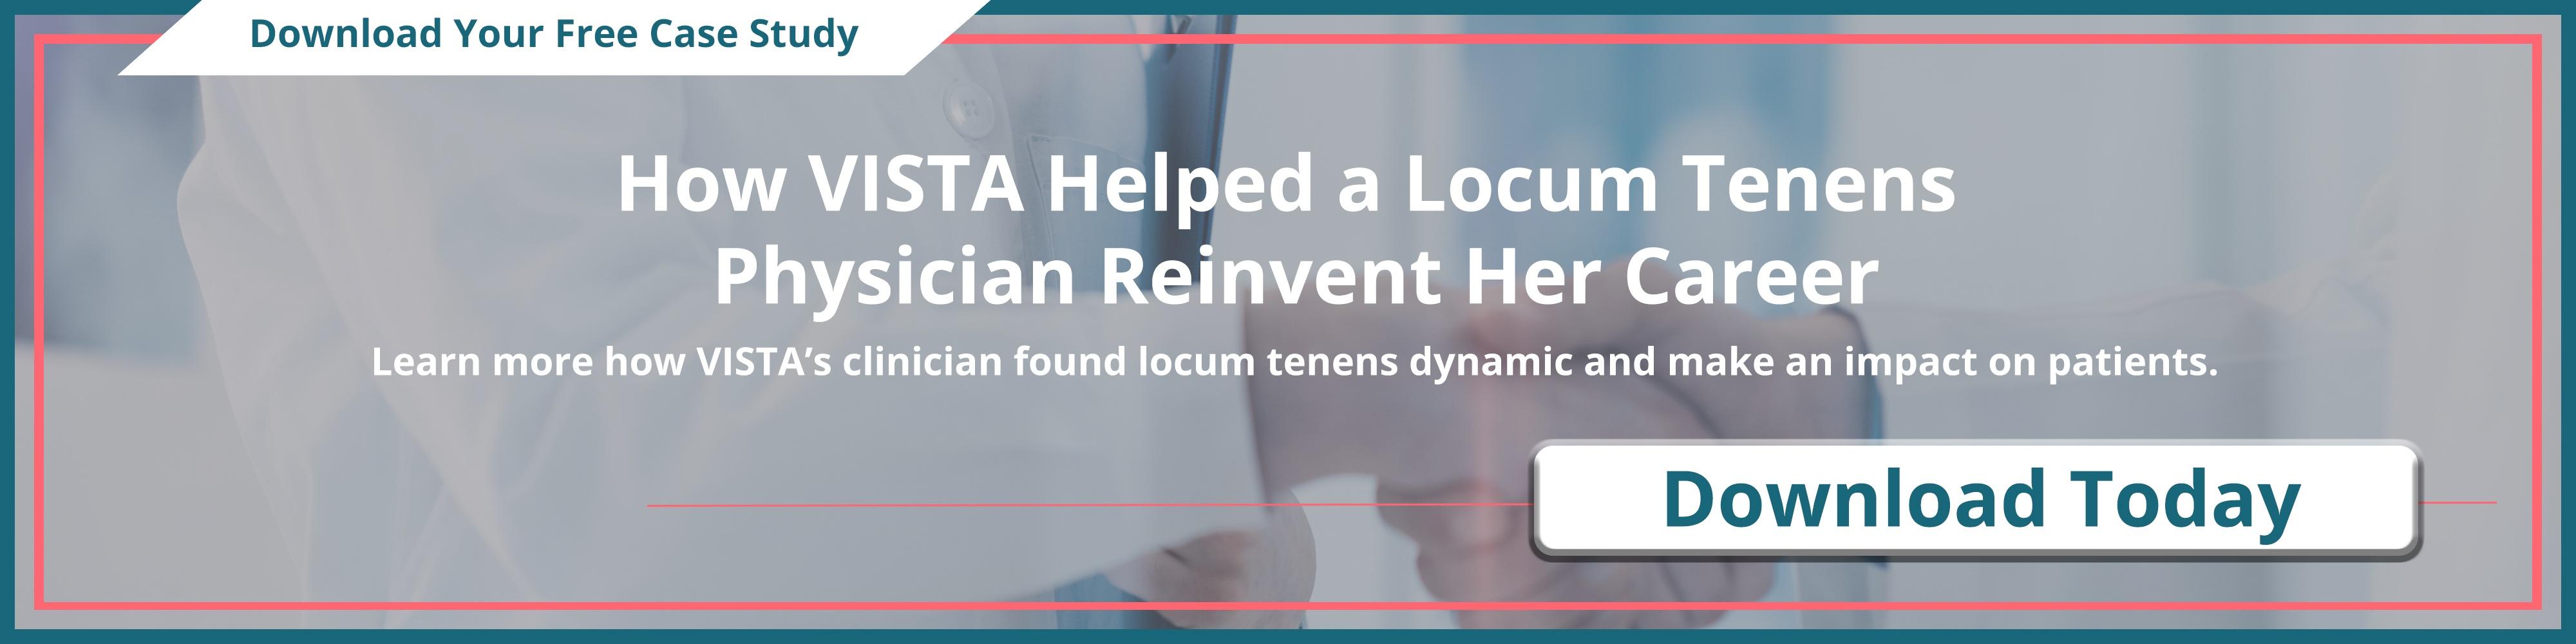 VISTA Helped a Locum Tenens Physician Reinvent Her Career